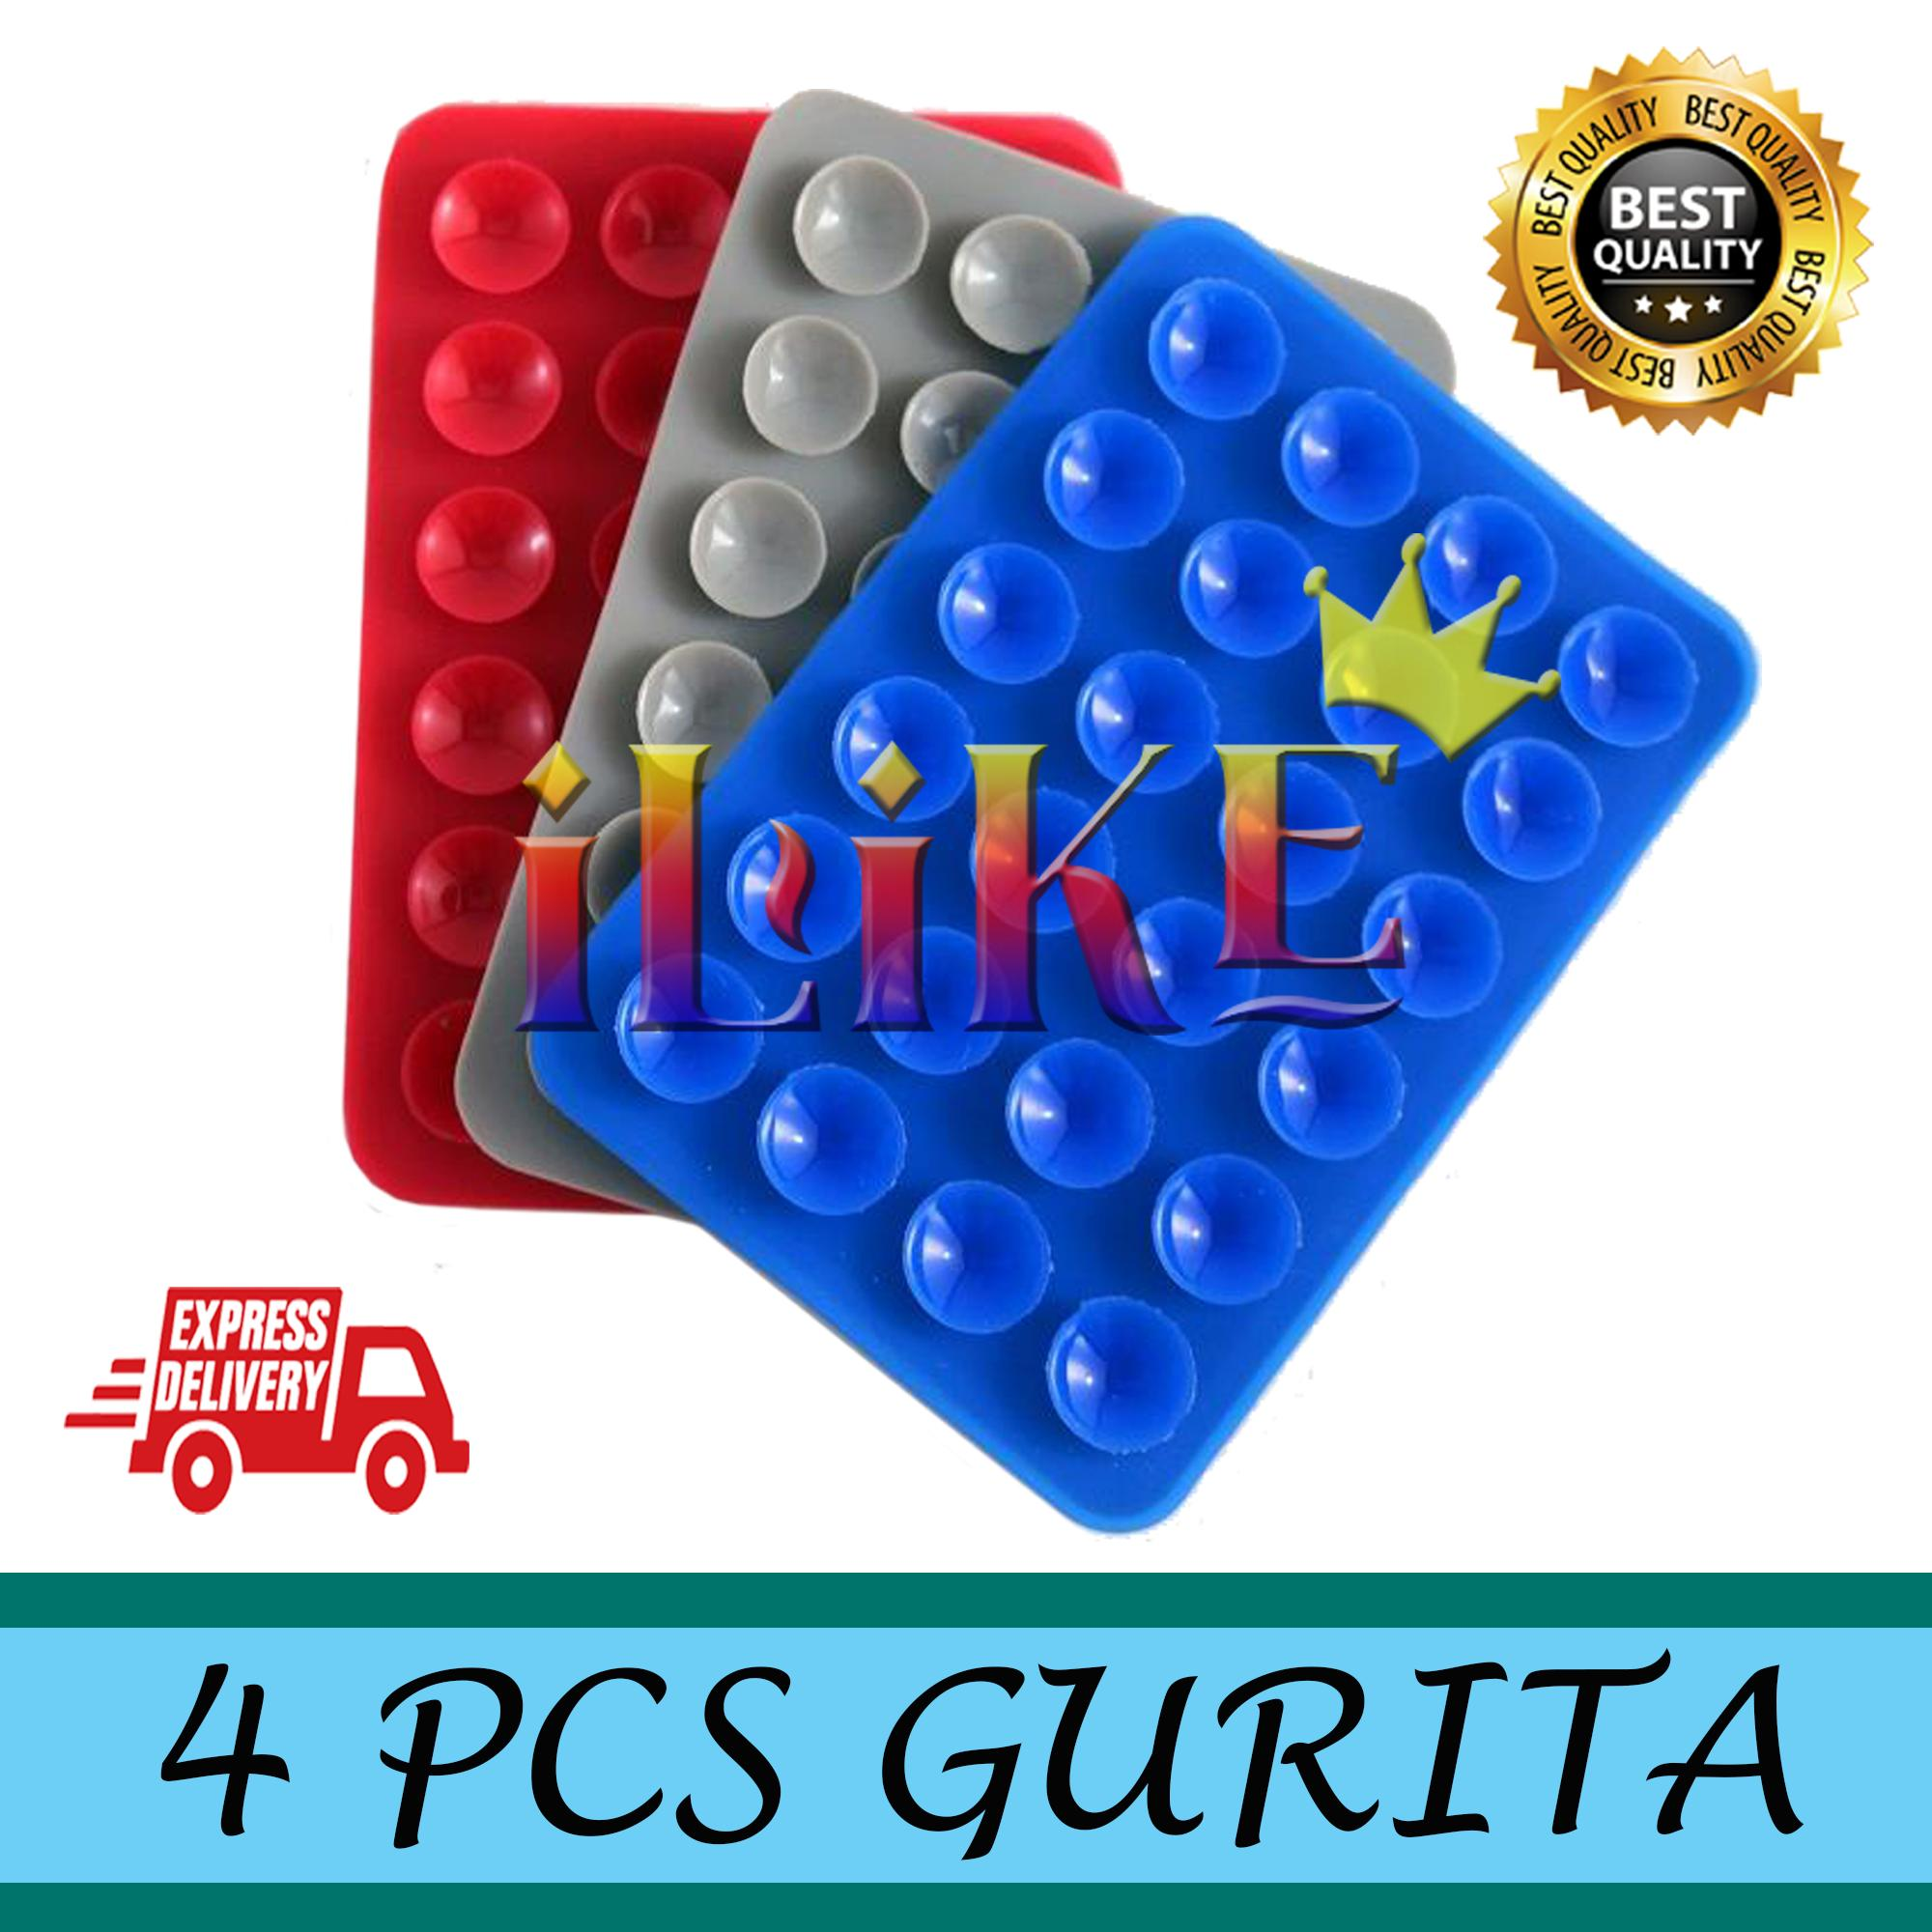 Rp 7.999 iLike Gurita HP 24 Tentakel Universal Phone Holder High Quality ...